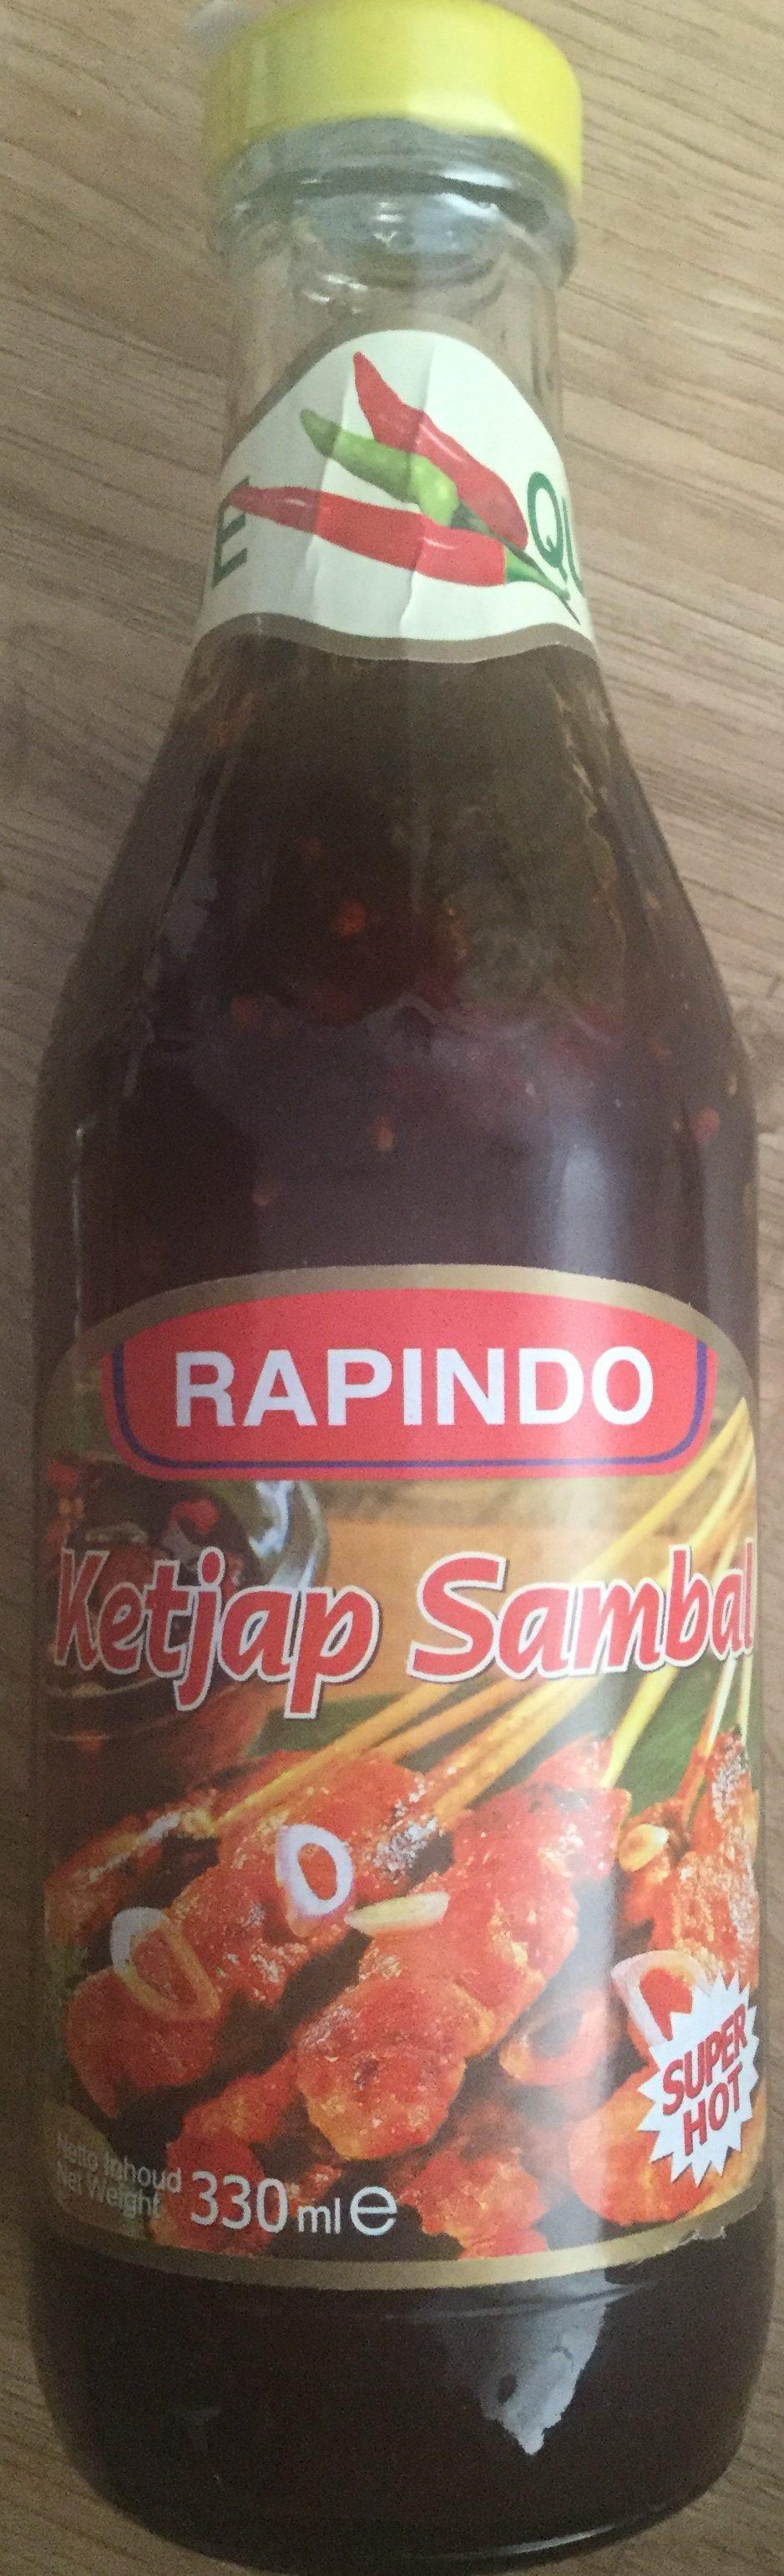 Ketjap sambal - Product - nl